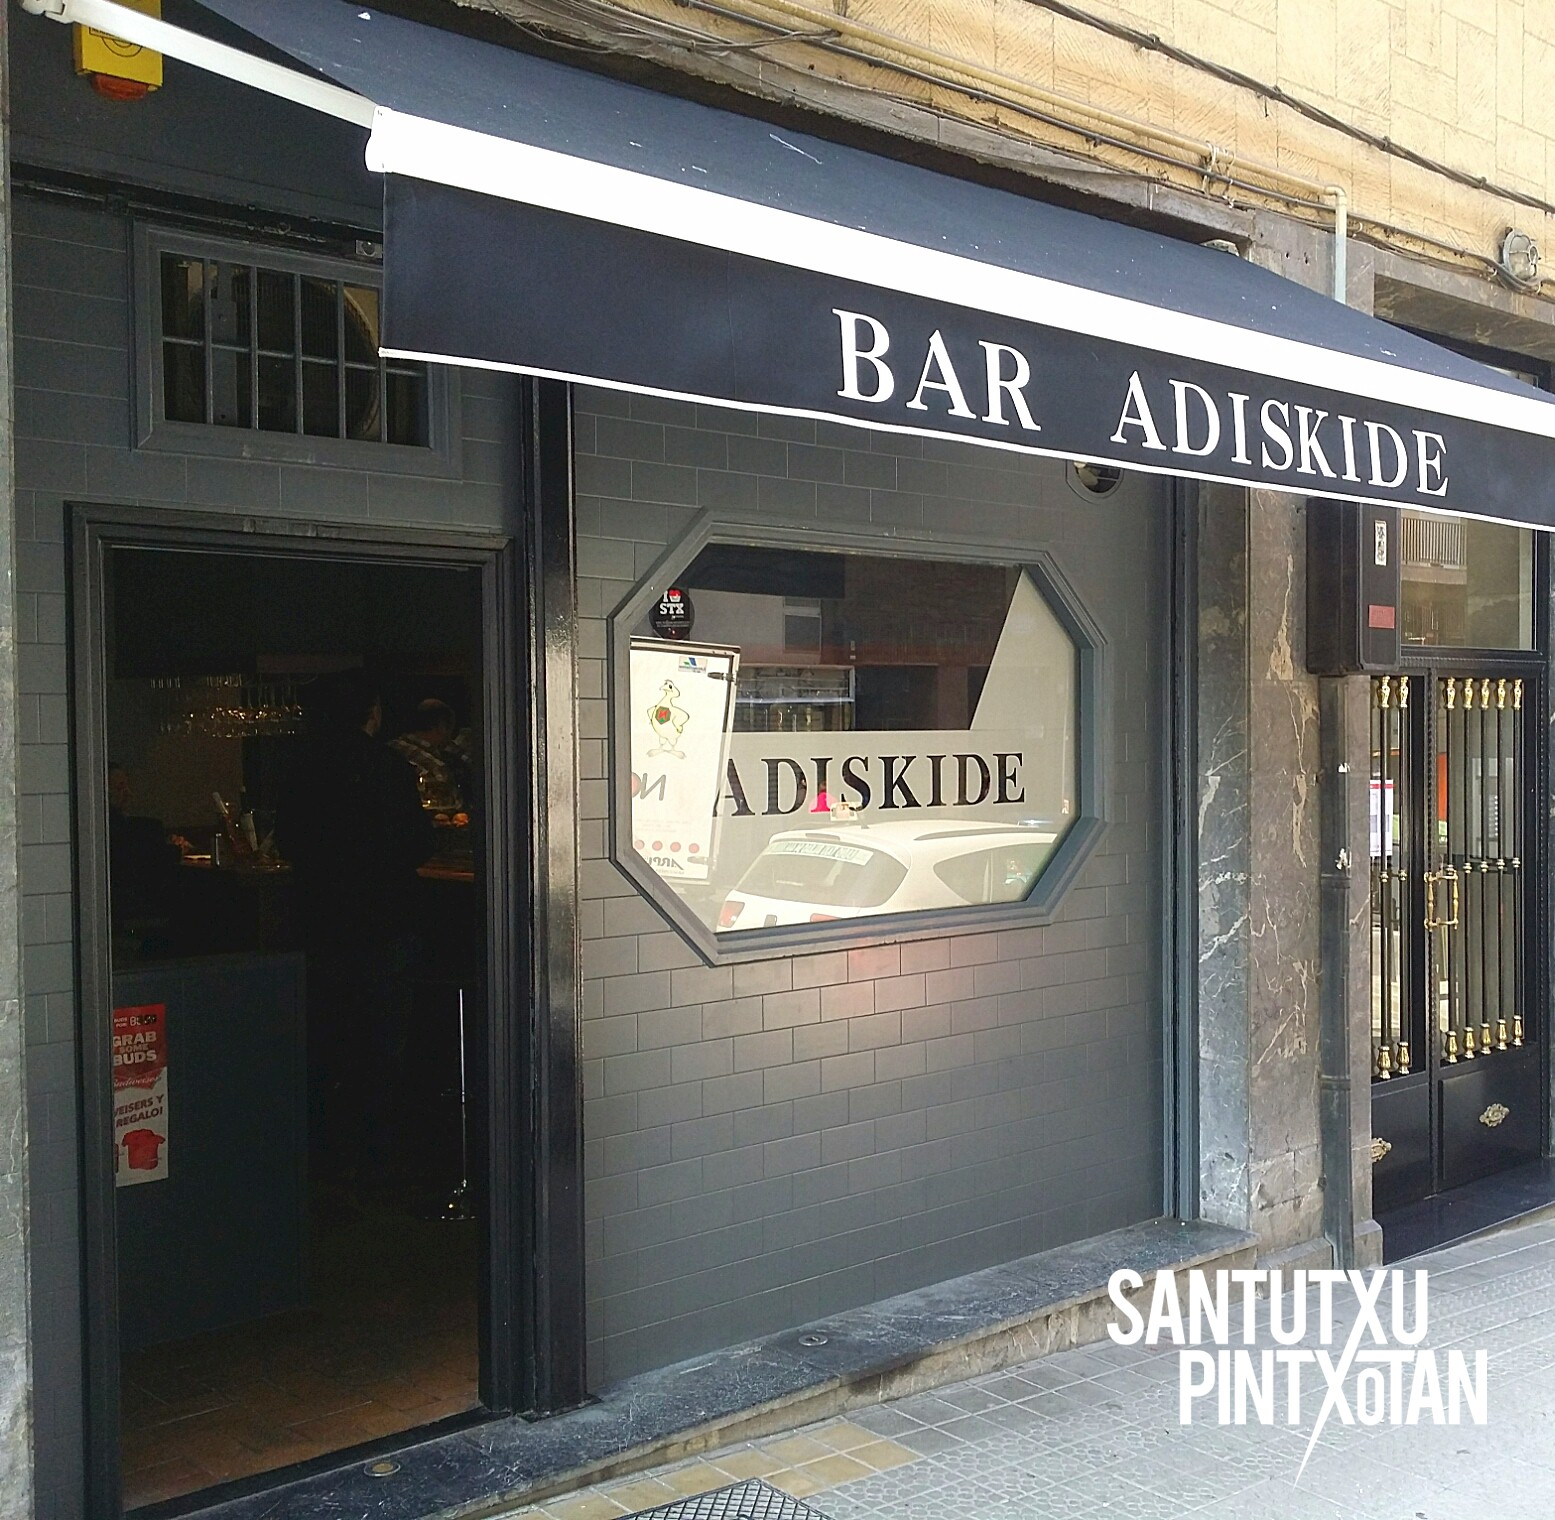 Bar Adiskide - Santutxu